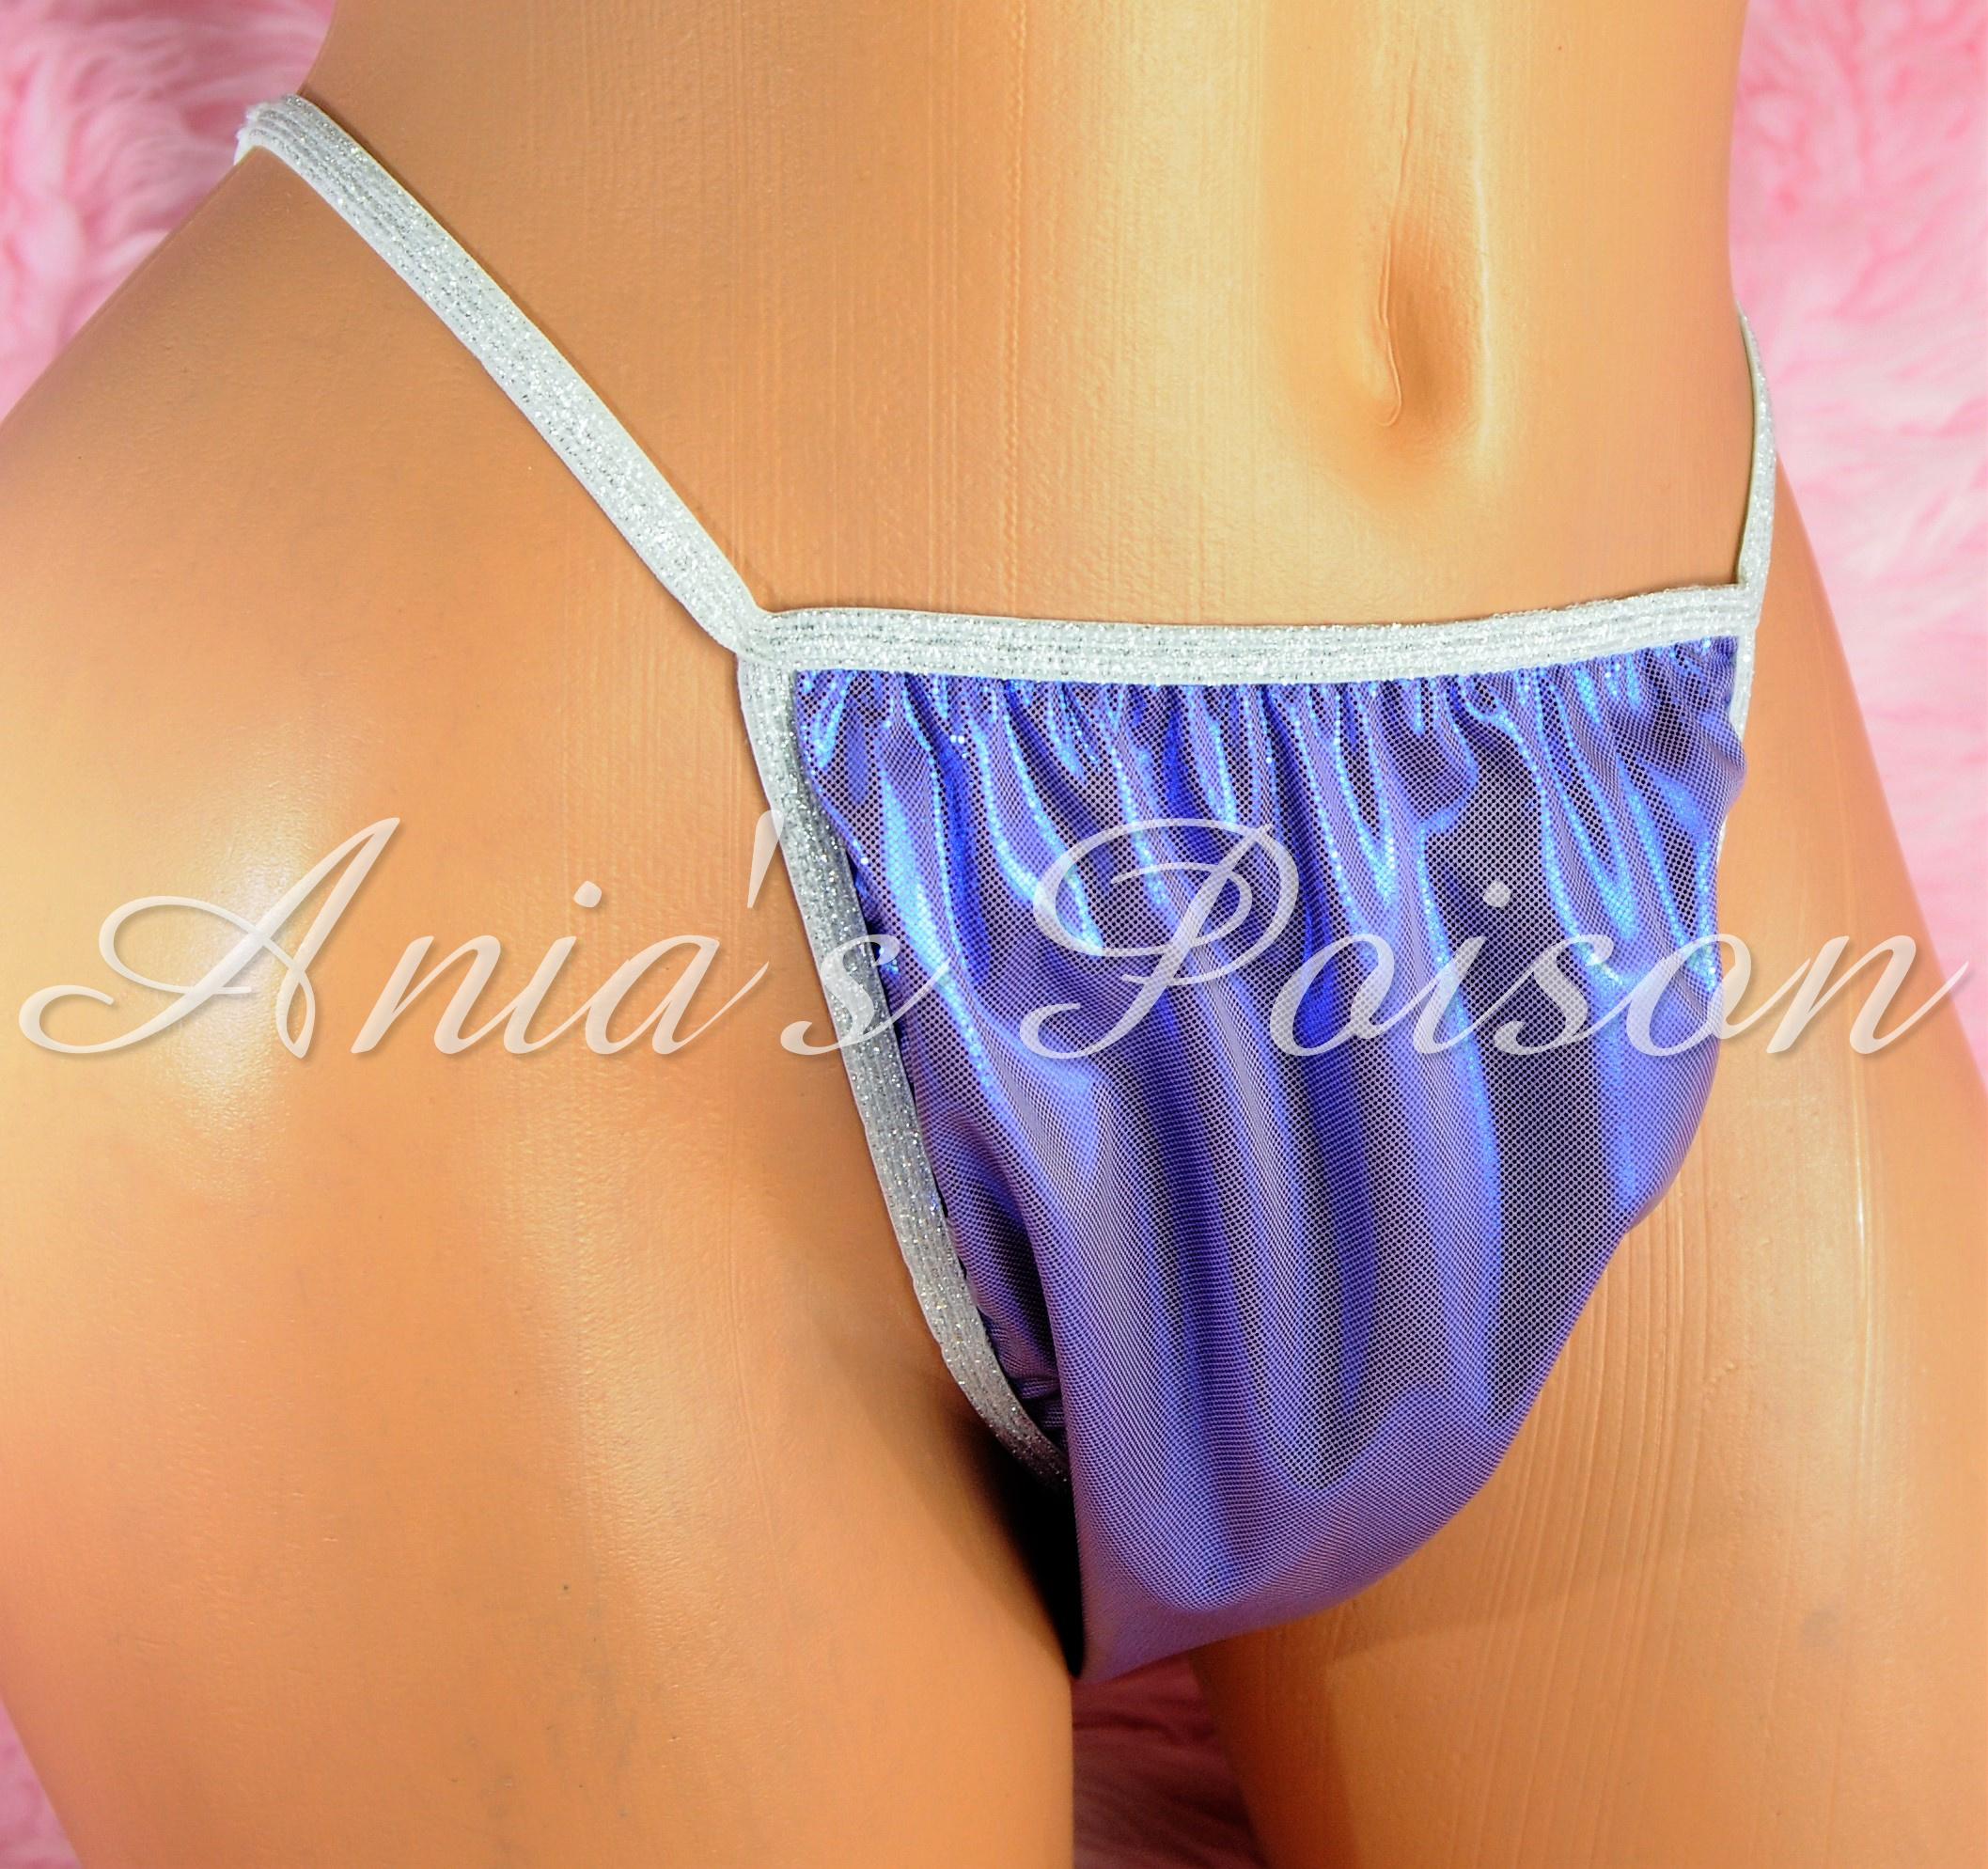 NEW COLORS!  S - XXL metallic shiny FOIL MANties Brazilian Cheeky cut string bikini sissy mens Sissy underwear panties